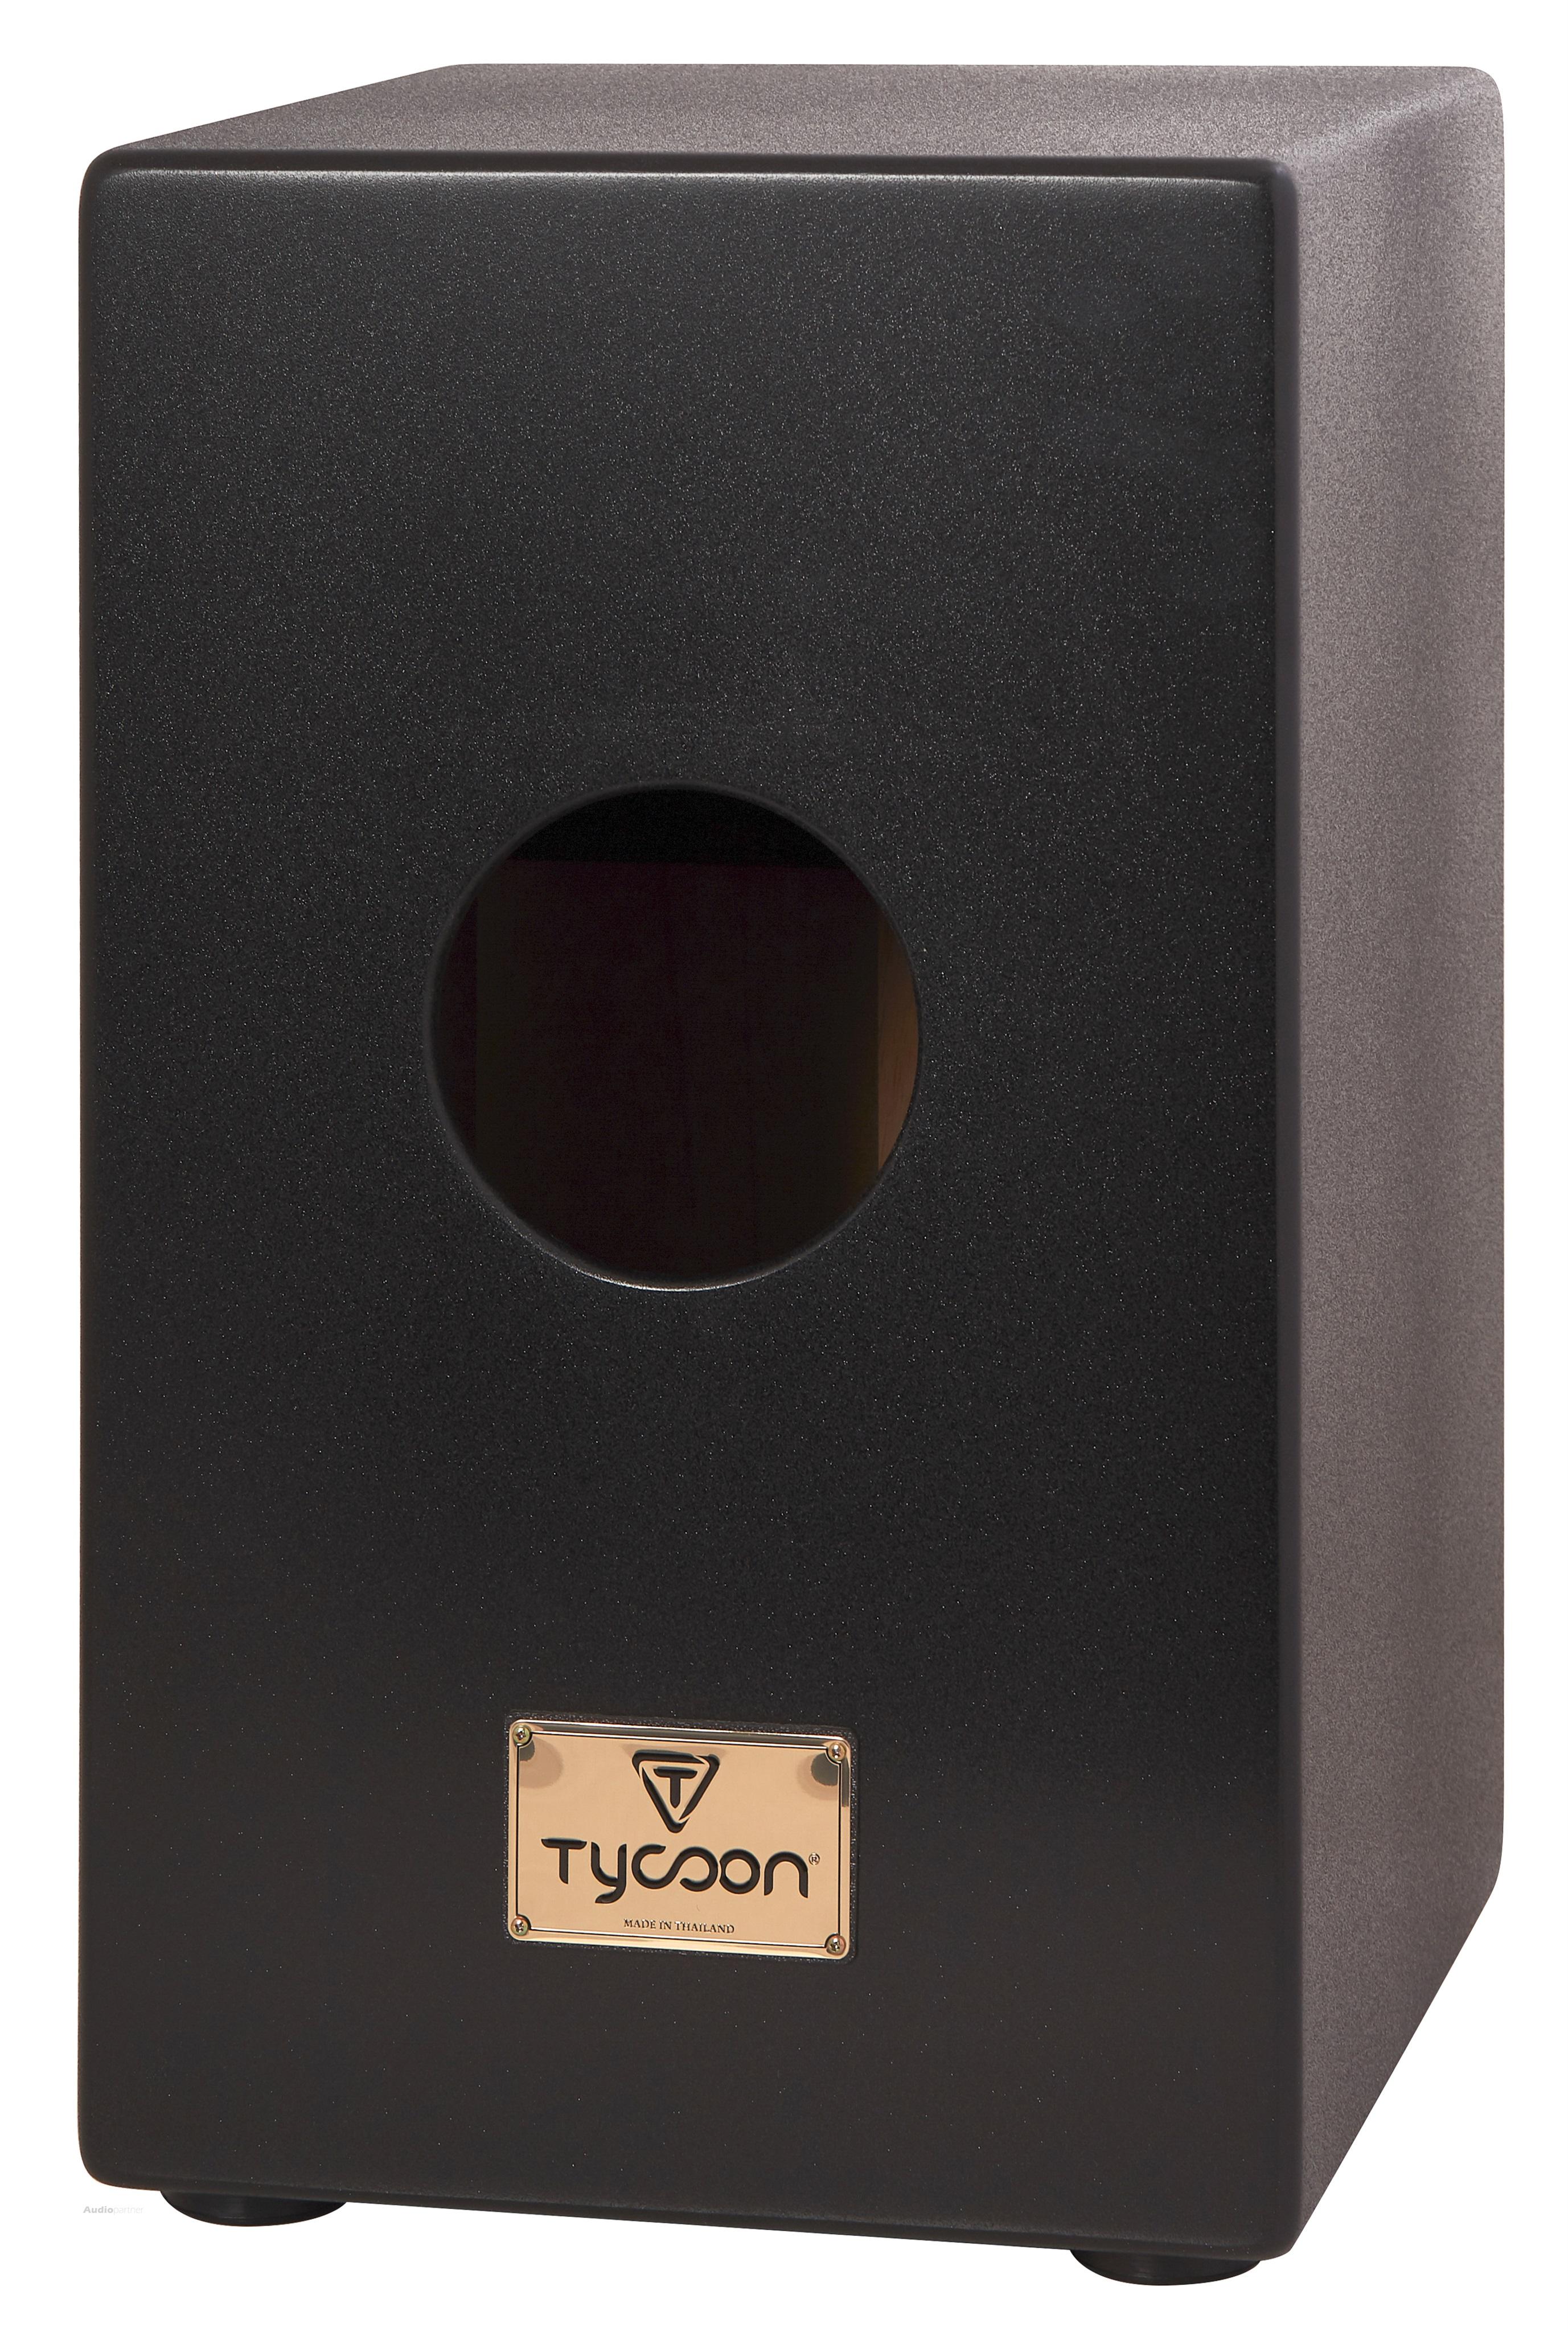 TYCOON STK-29 Cajon